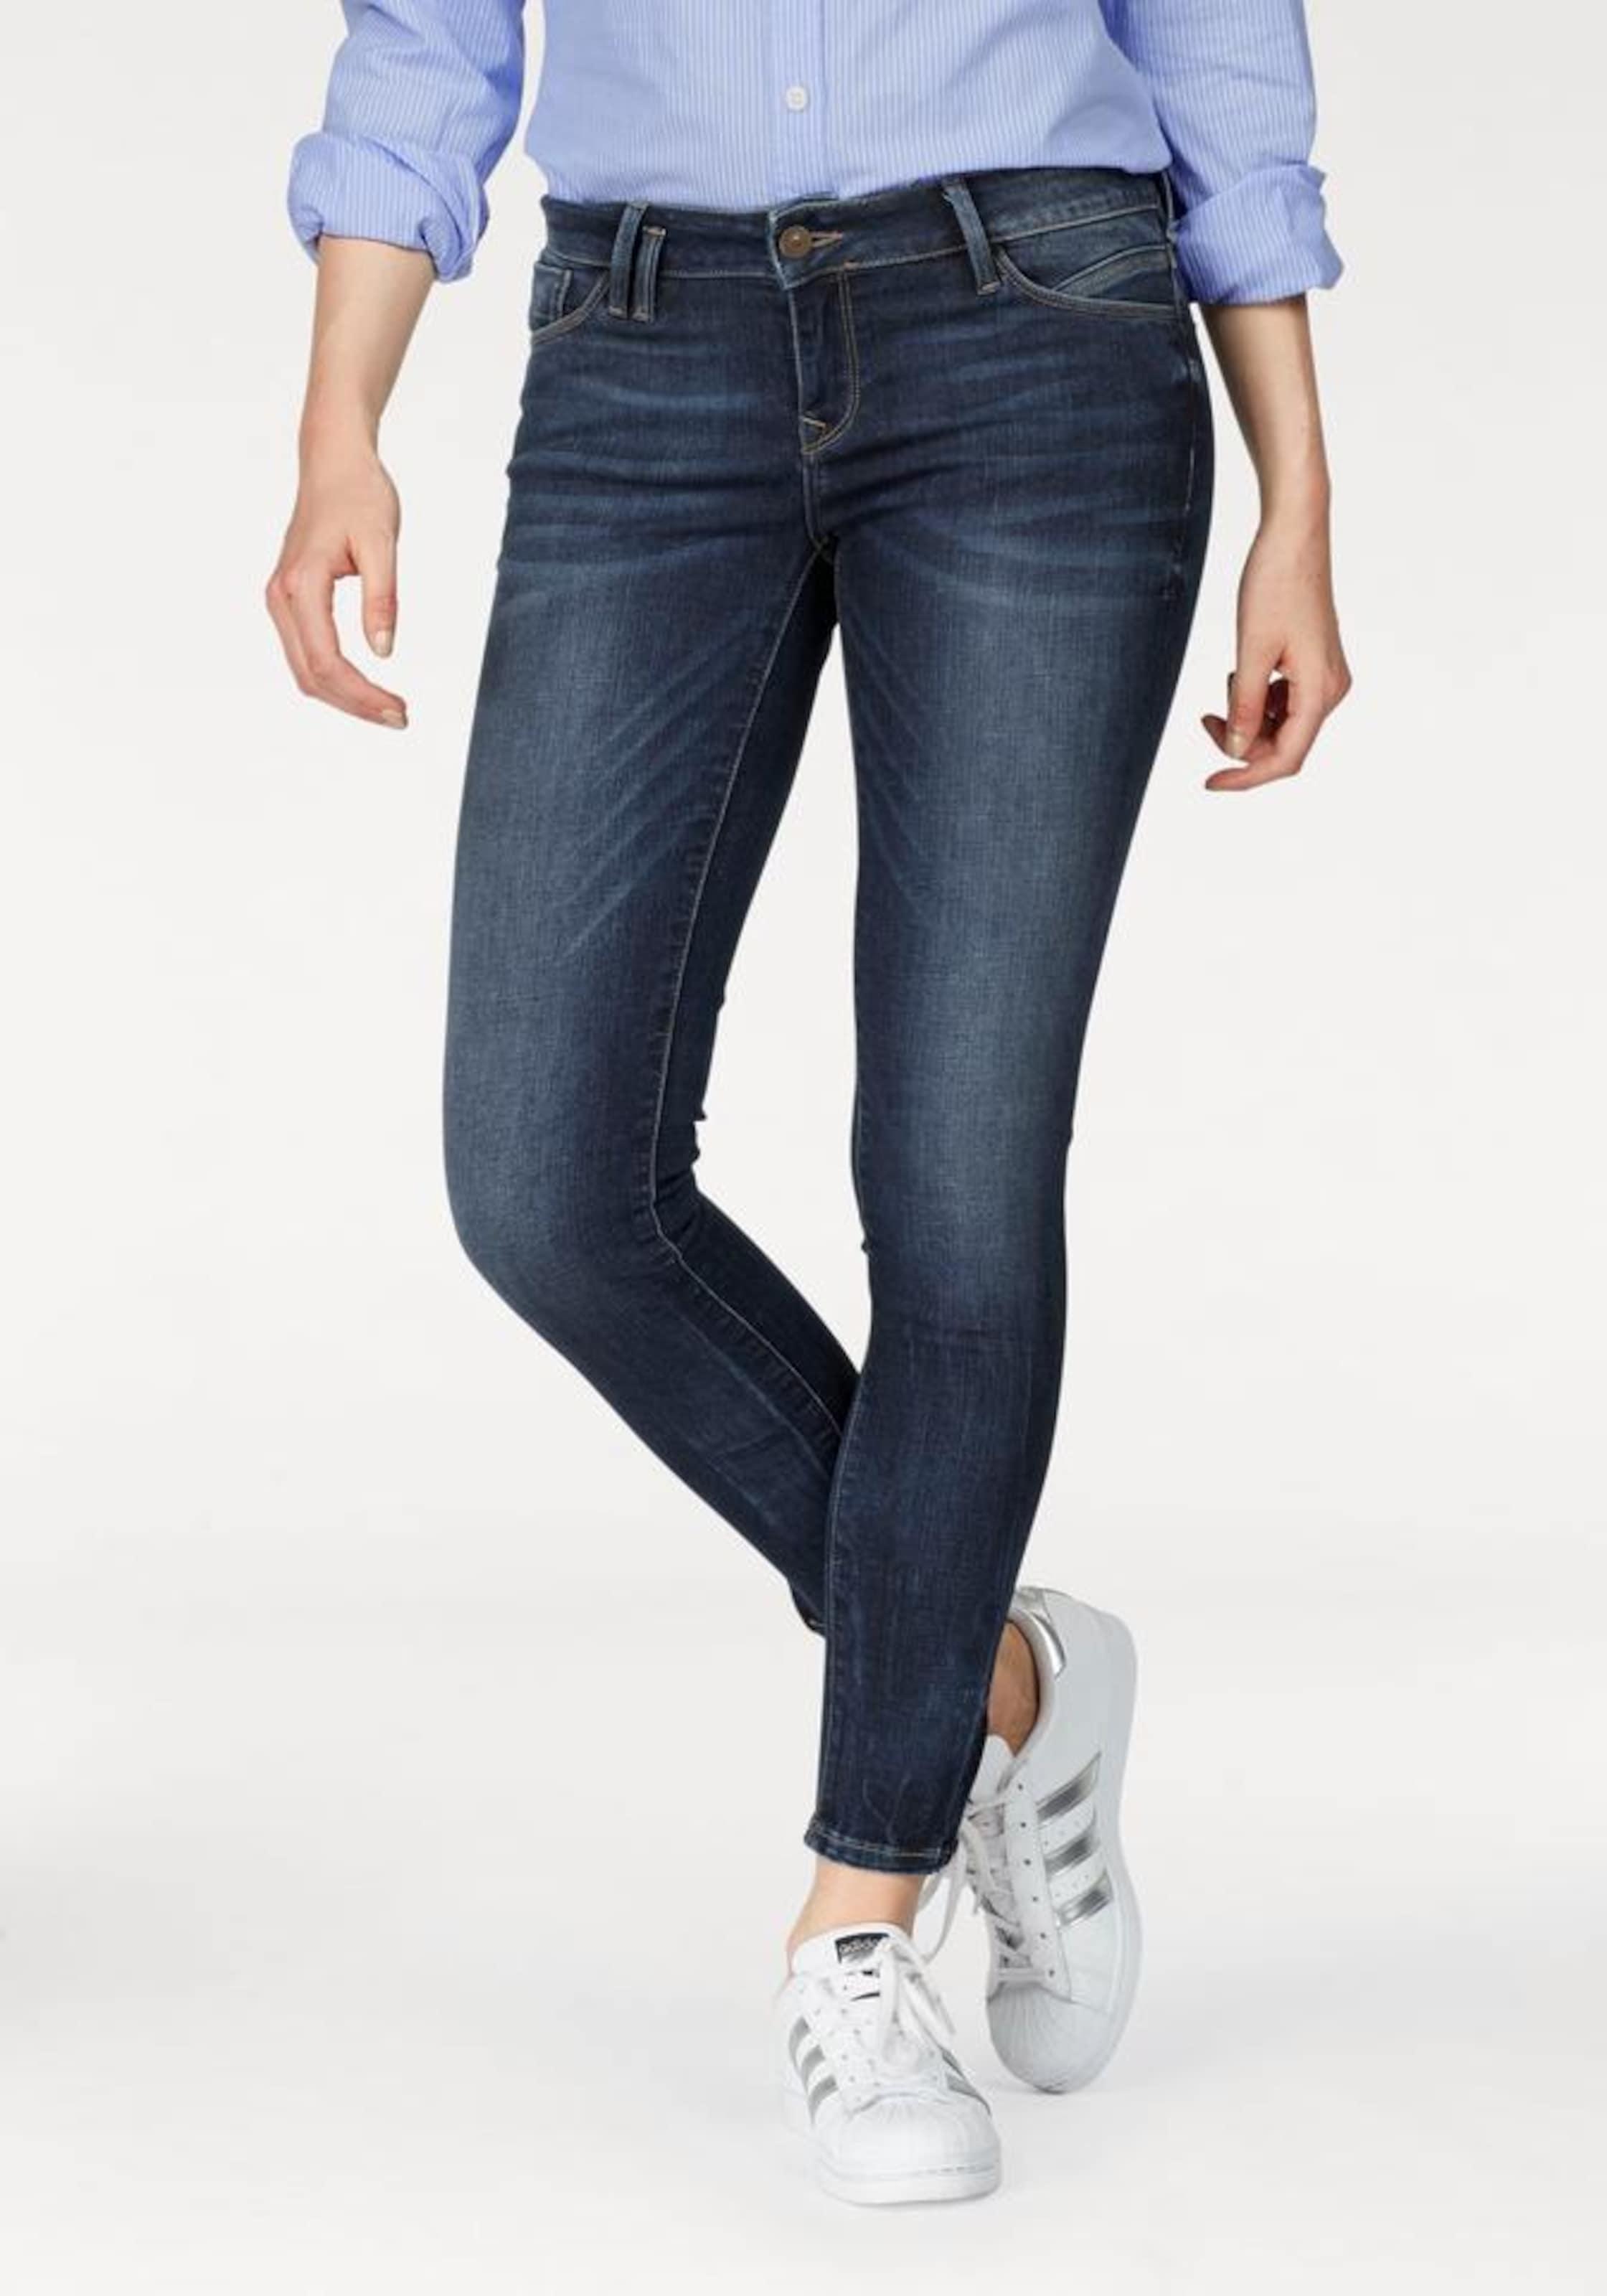 Cross Jeans Skinny-fit-Jeans Rabatt Sehr Billig m1YGsyg0